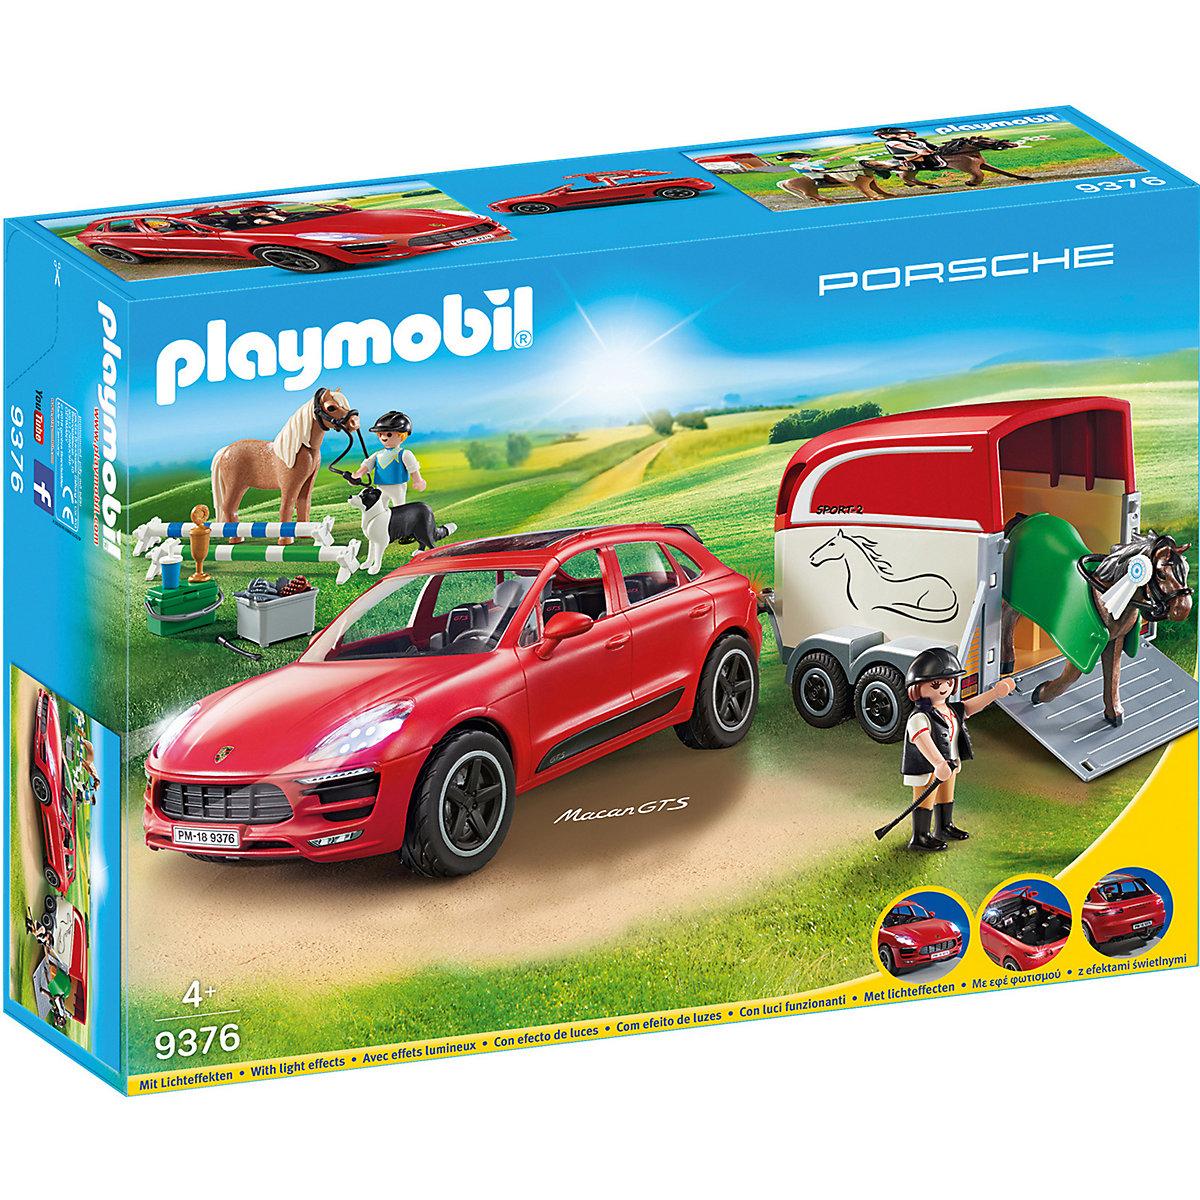 playmobil 9376 porsche macan gts playmobil city life. Black Bedroom Furniture Sets. Home Design Ideas